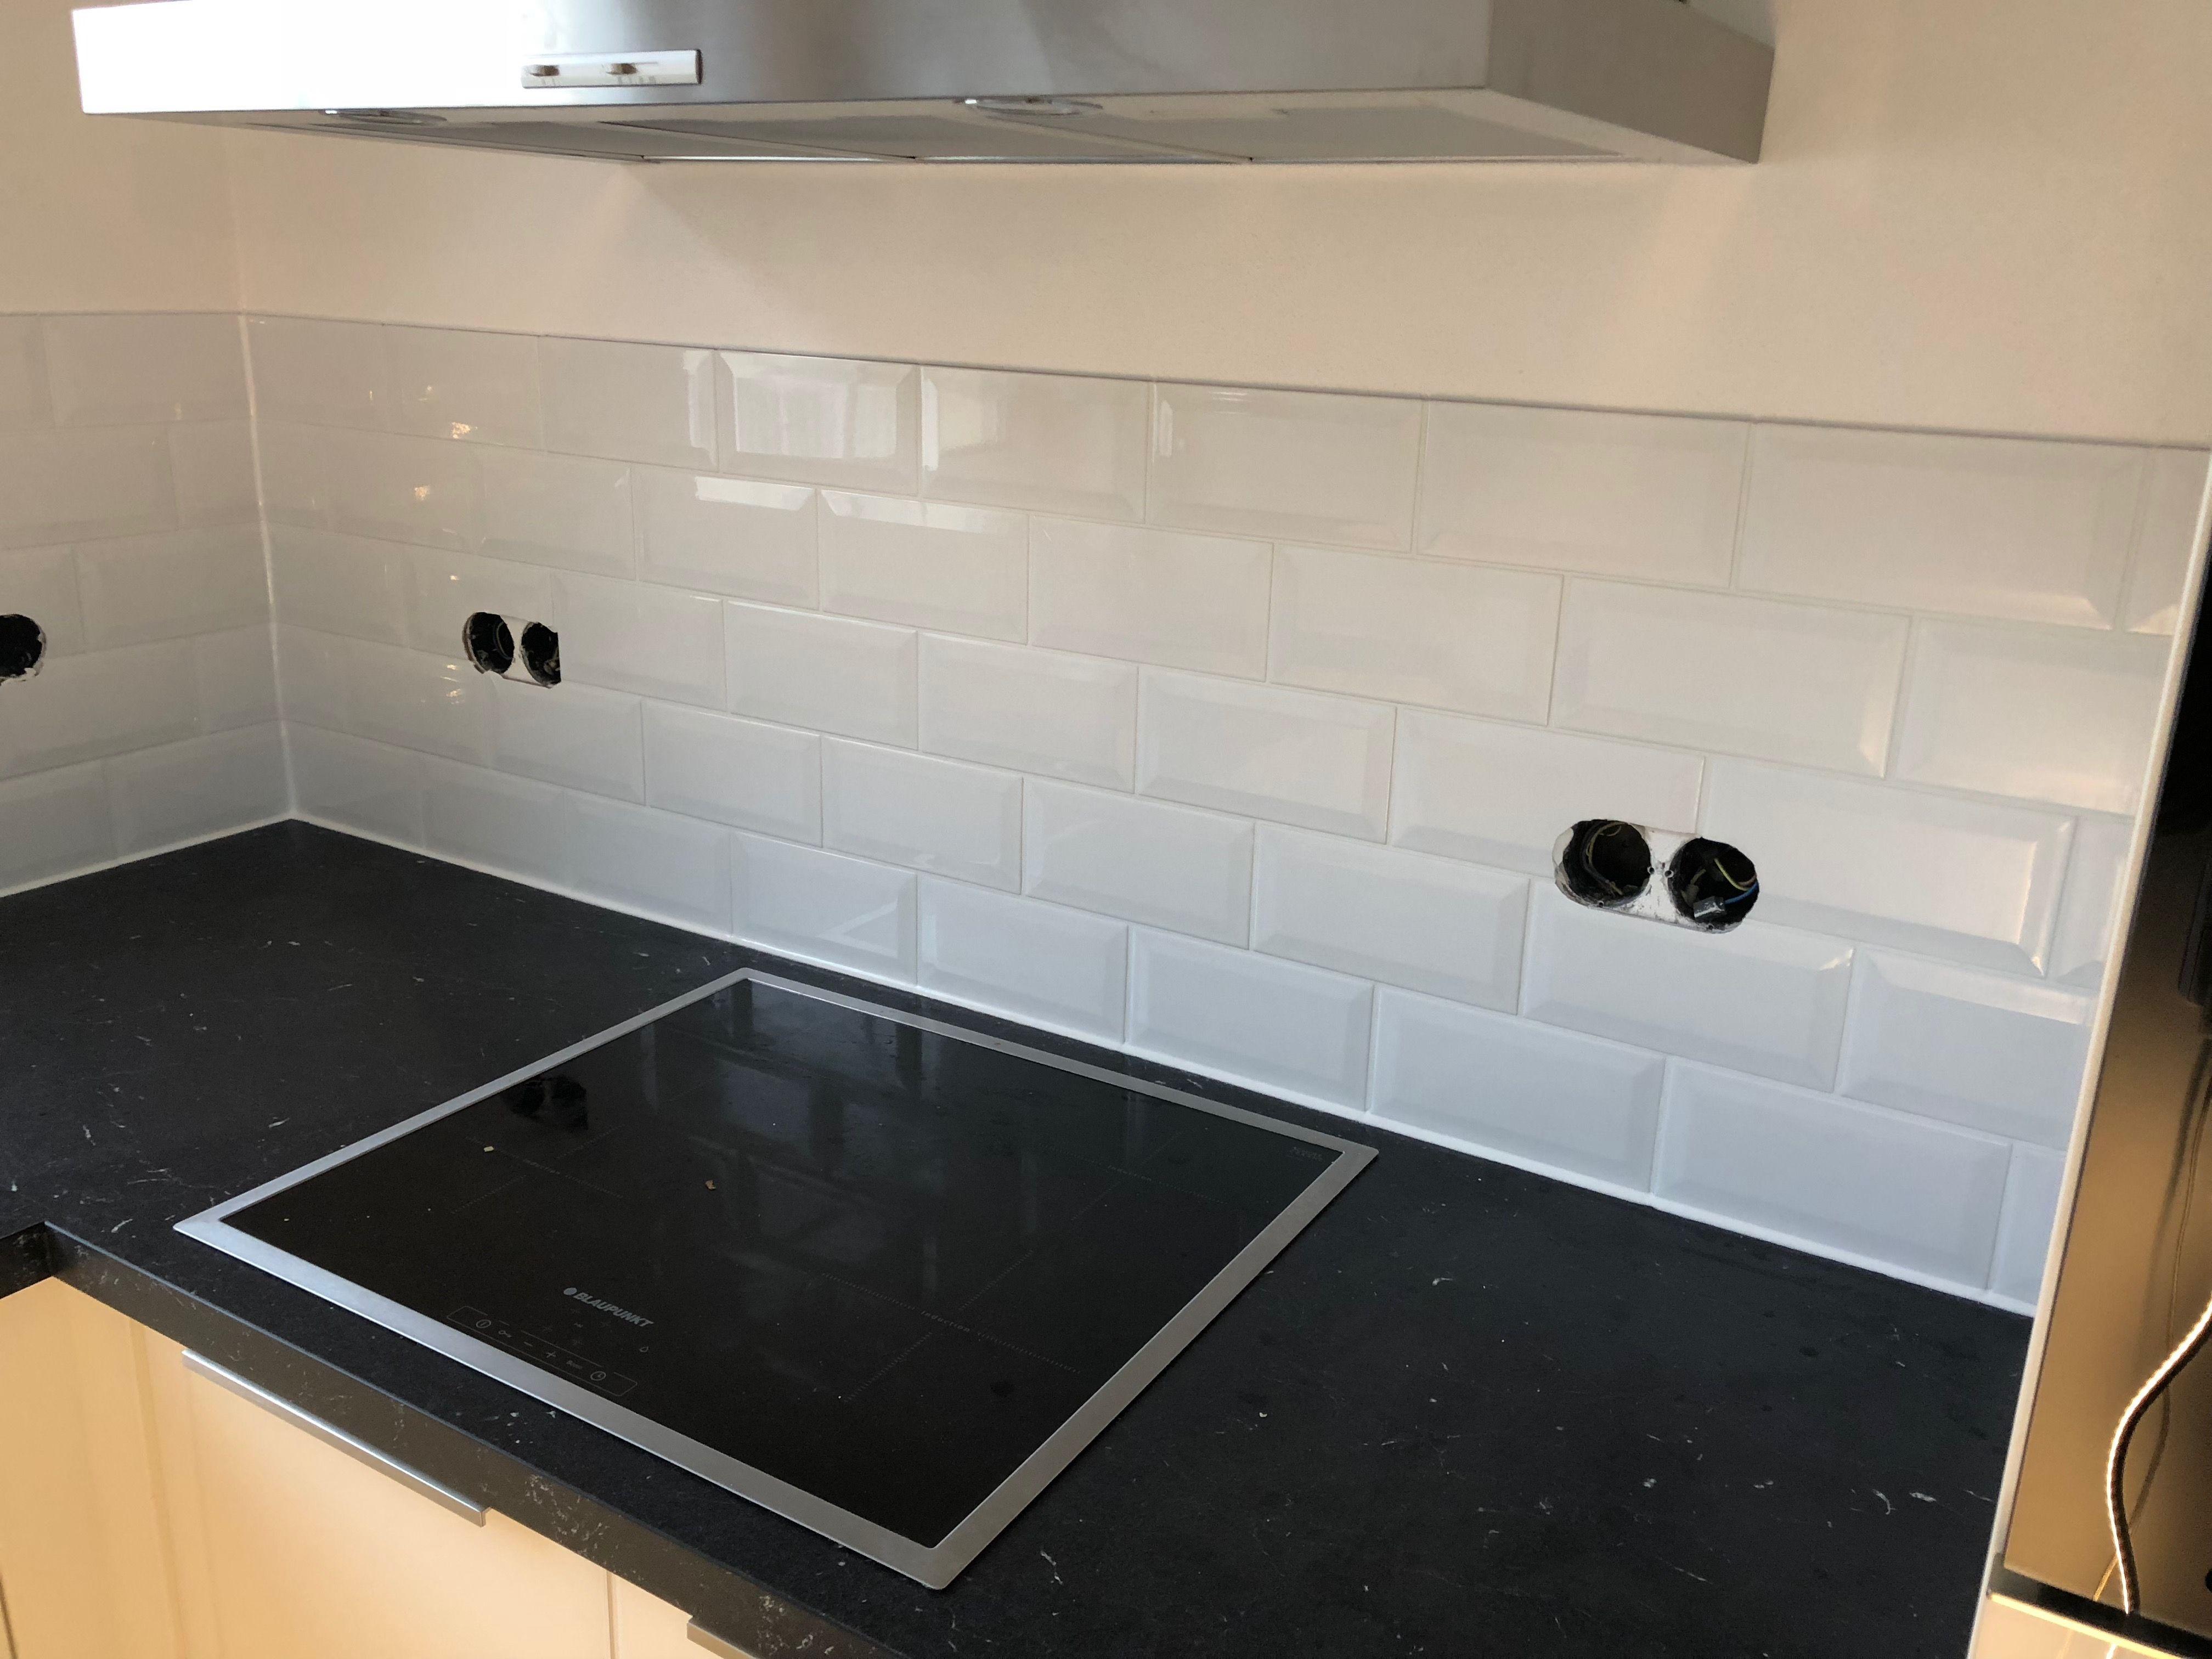 Metro Fliesenspiegel In Der Küche Mister Fliese De